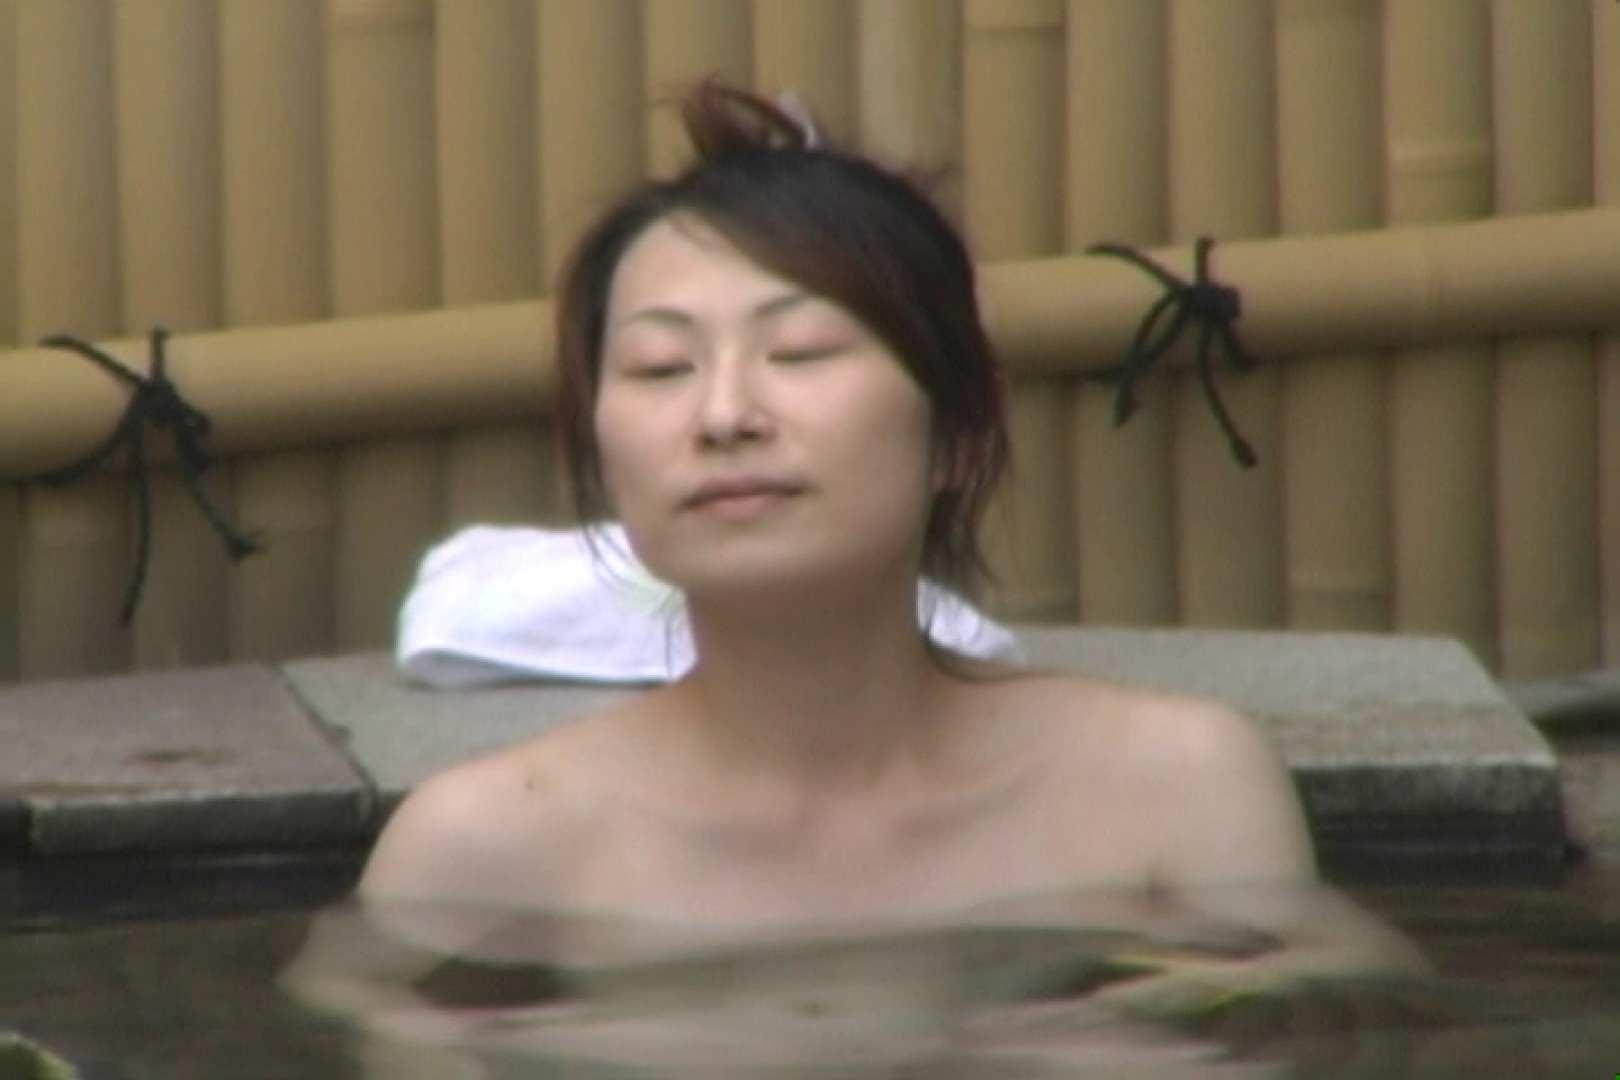 Aquaな露天風呂Vol.615 0   0  36連発 3